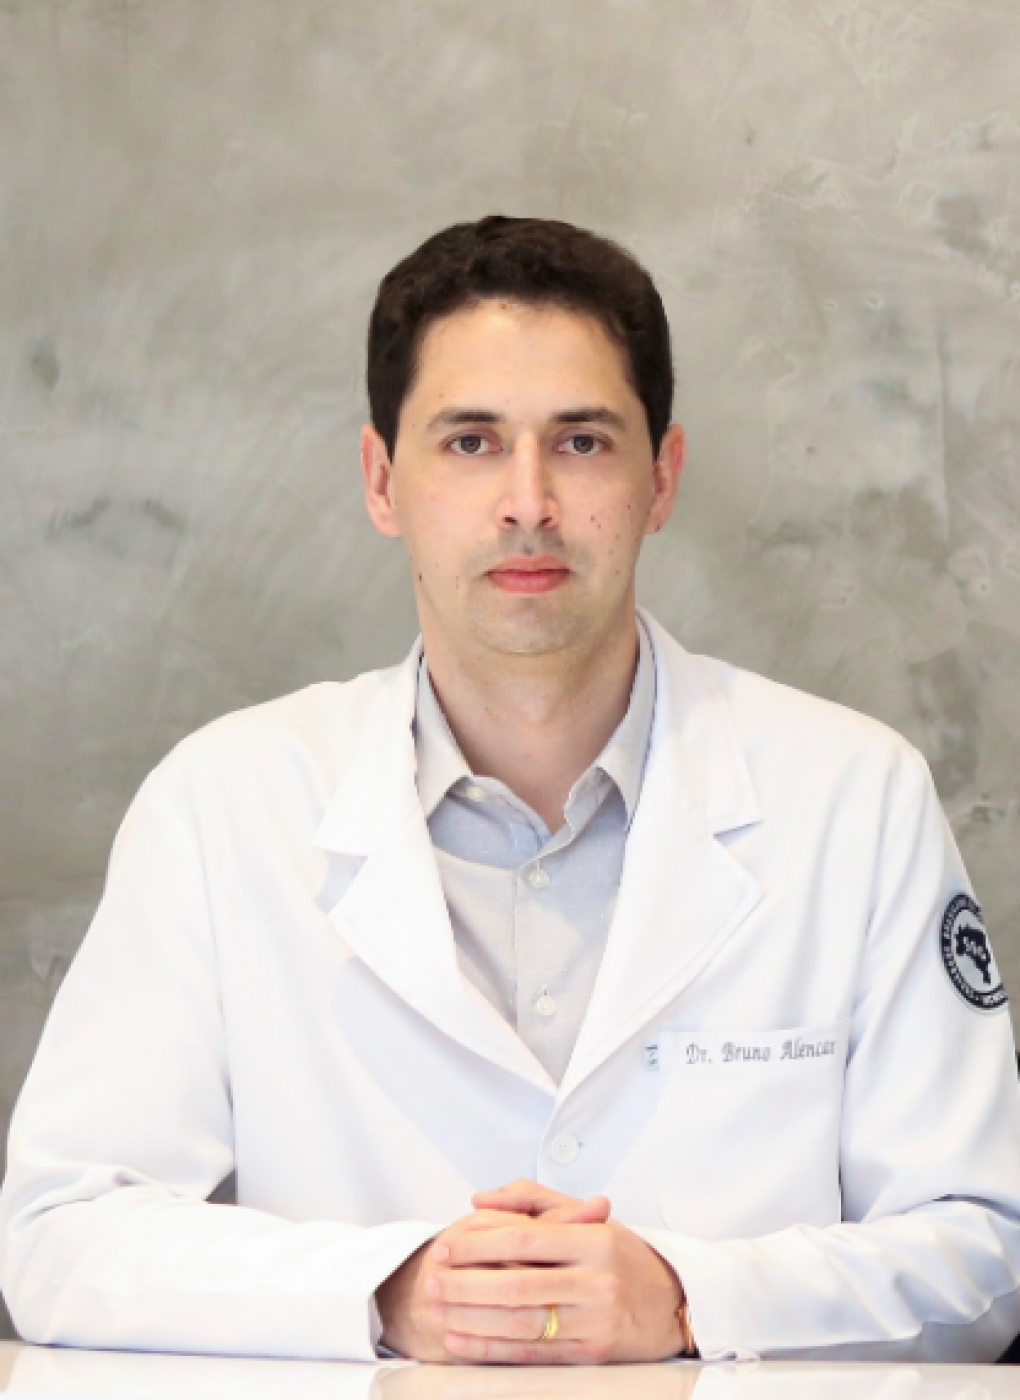 dr bruno cardiologista